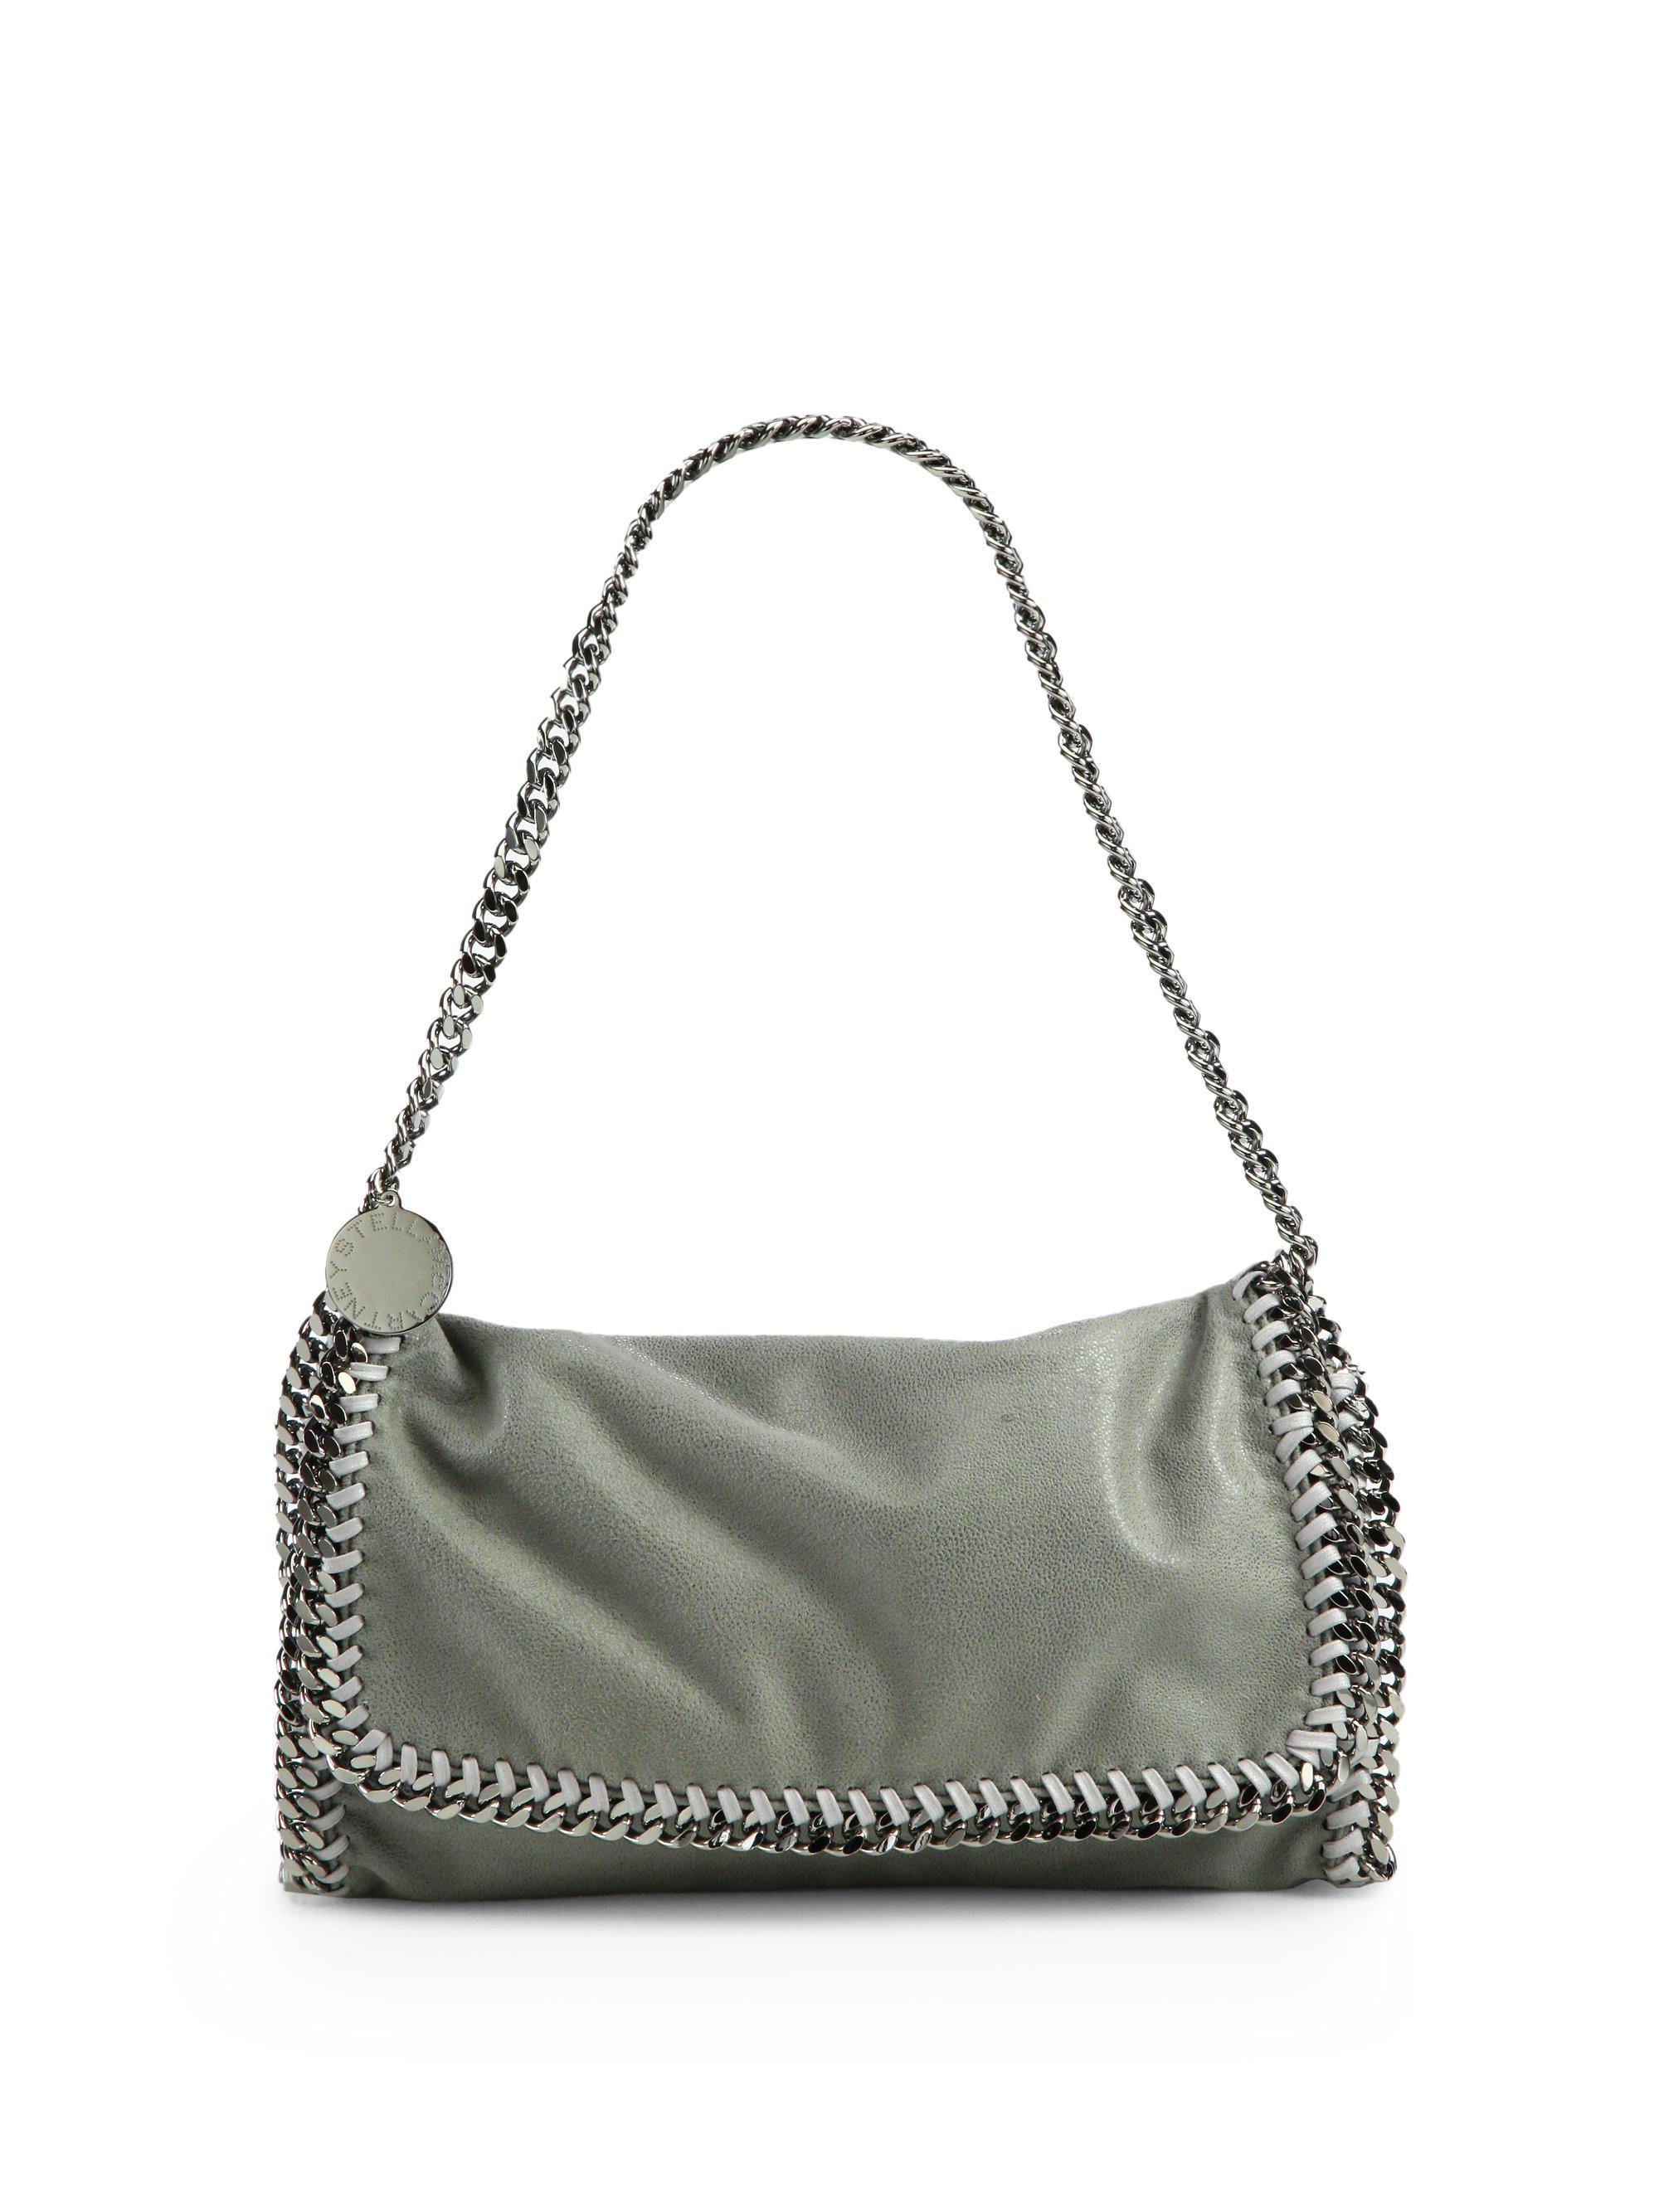 197d0ffe14d0 Saks Stella Mccartney Bags